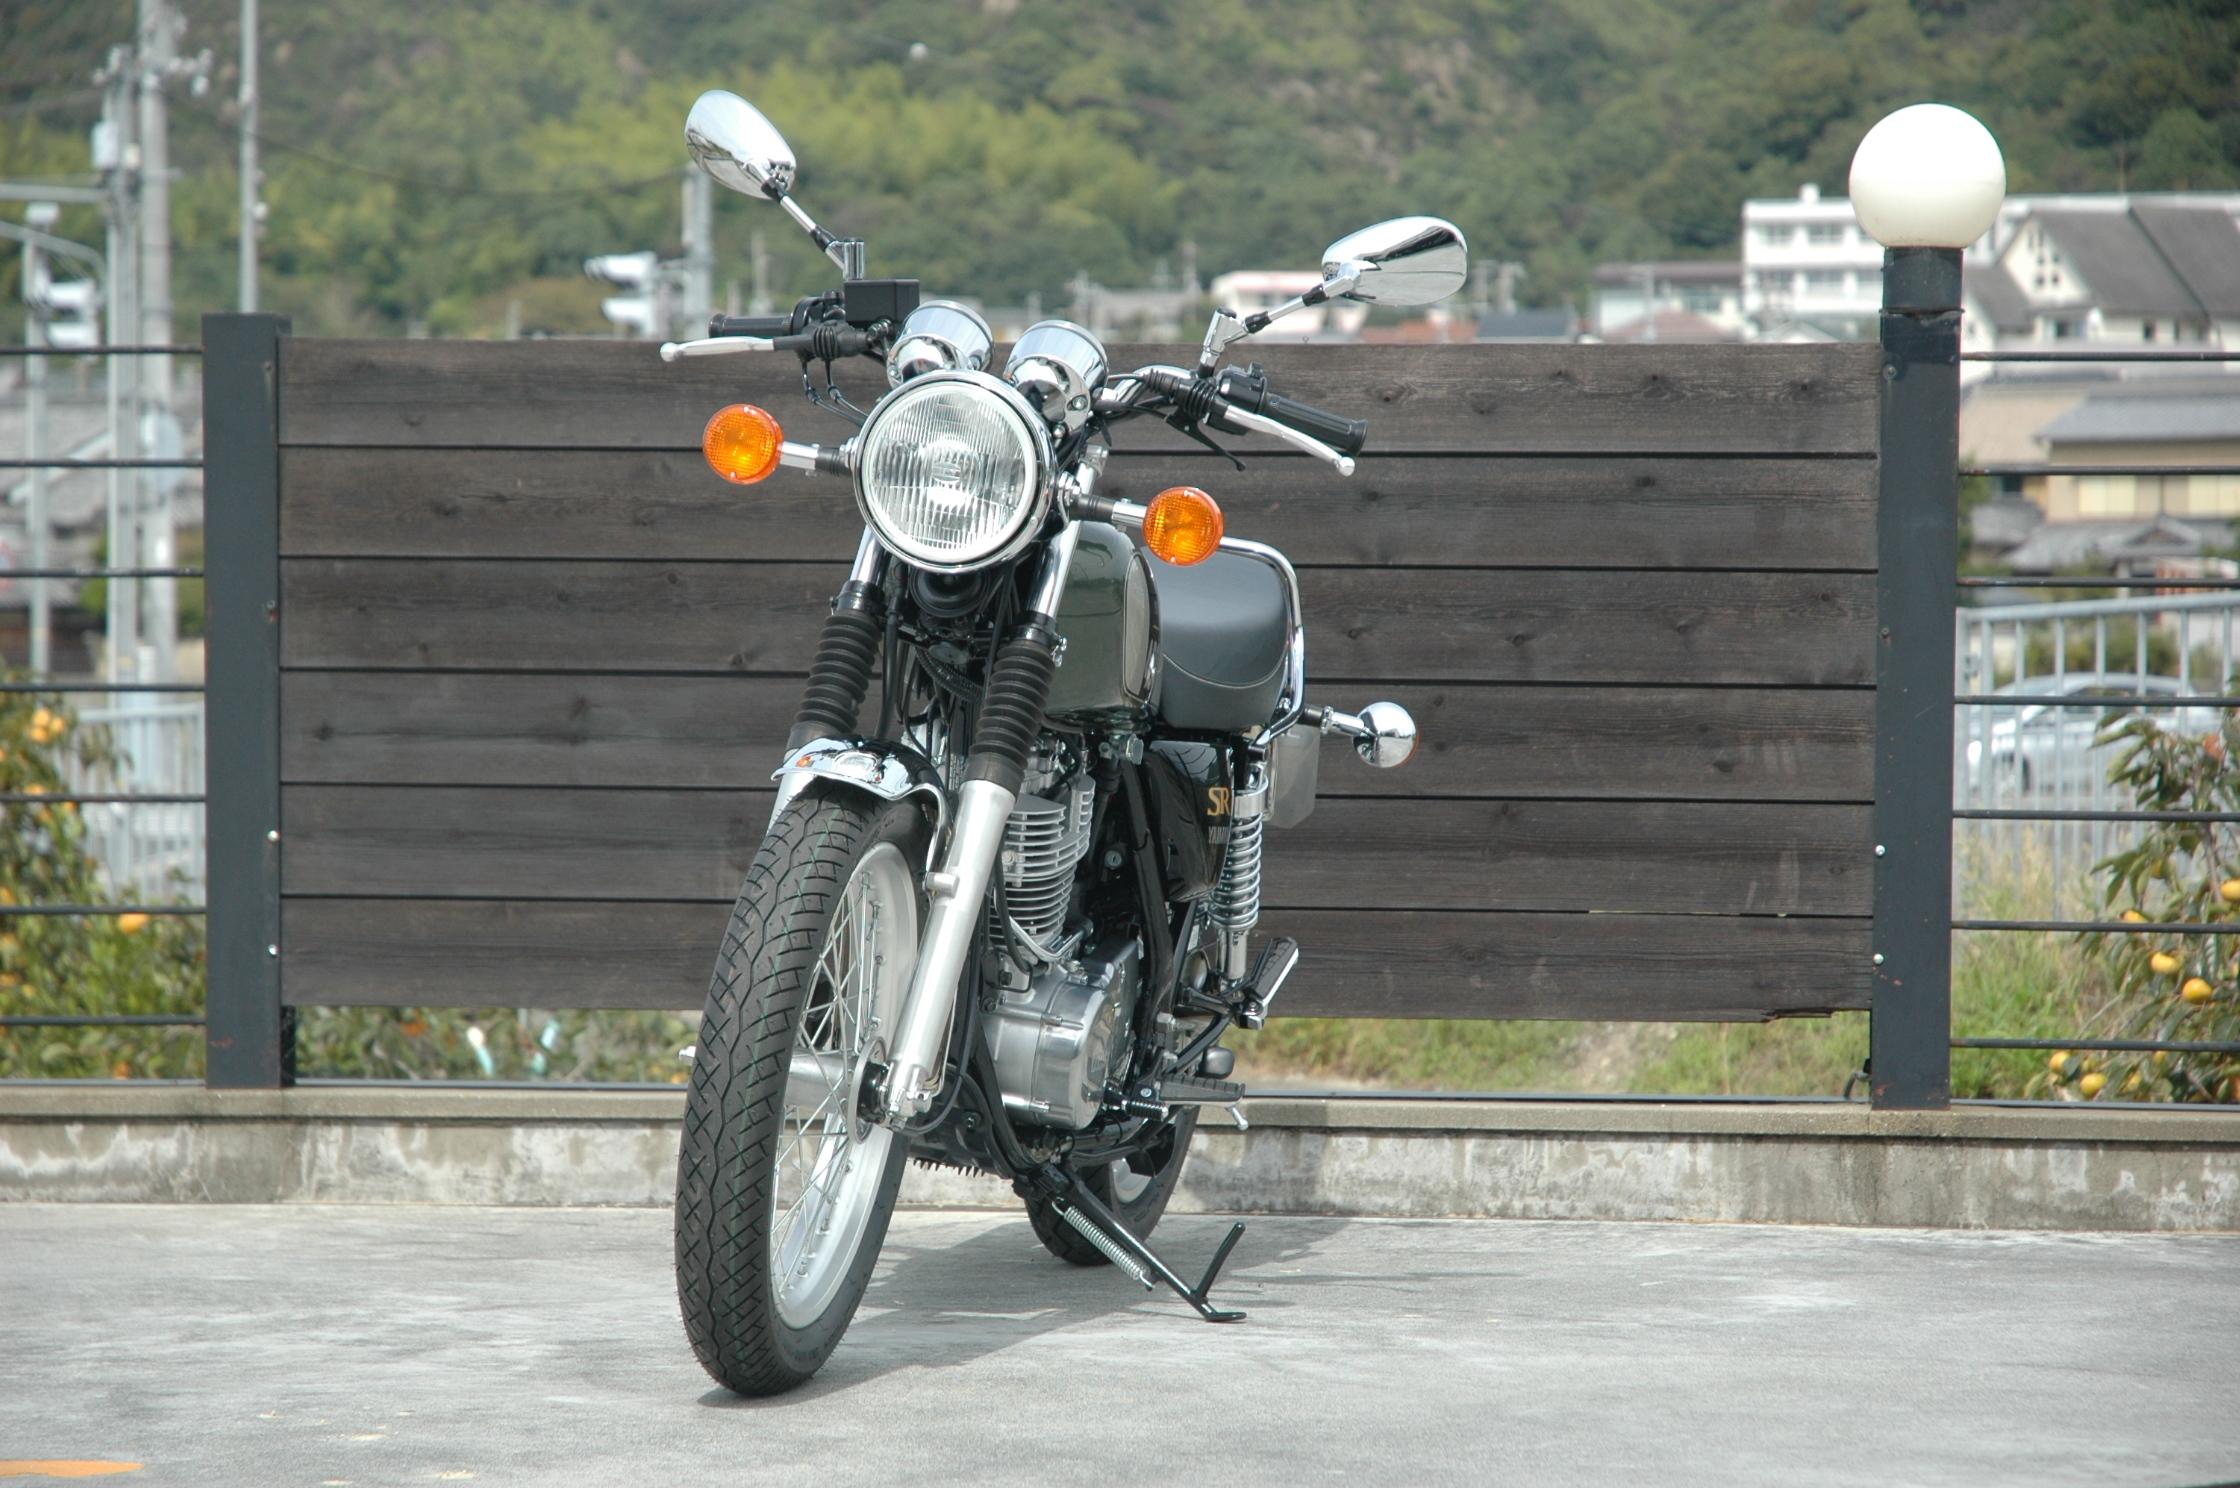 171006-sr400-3.jpg